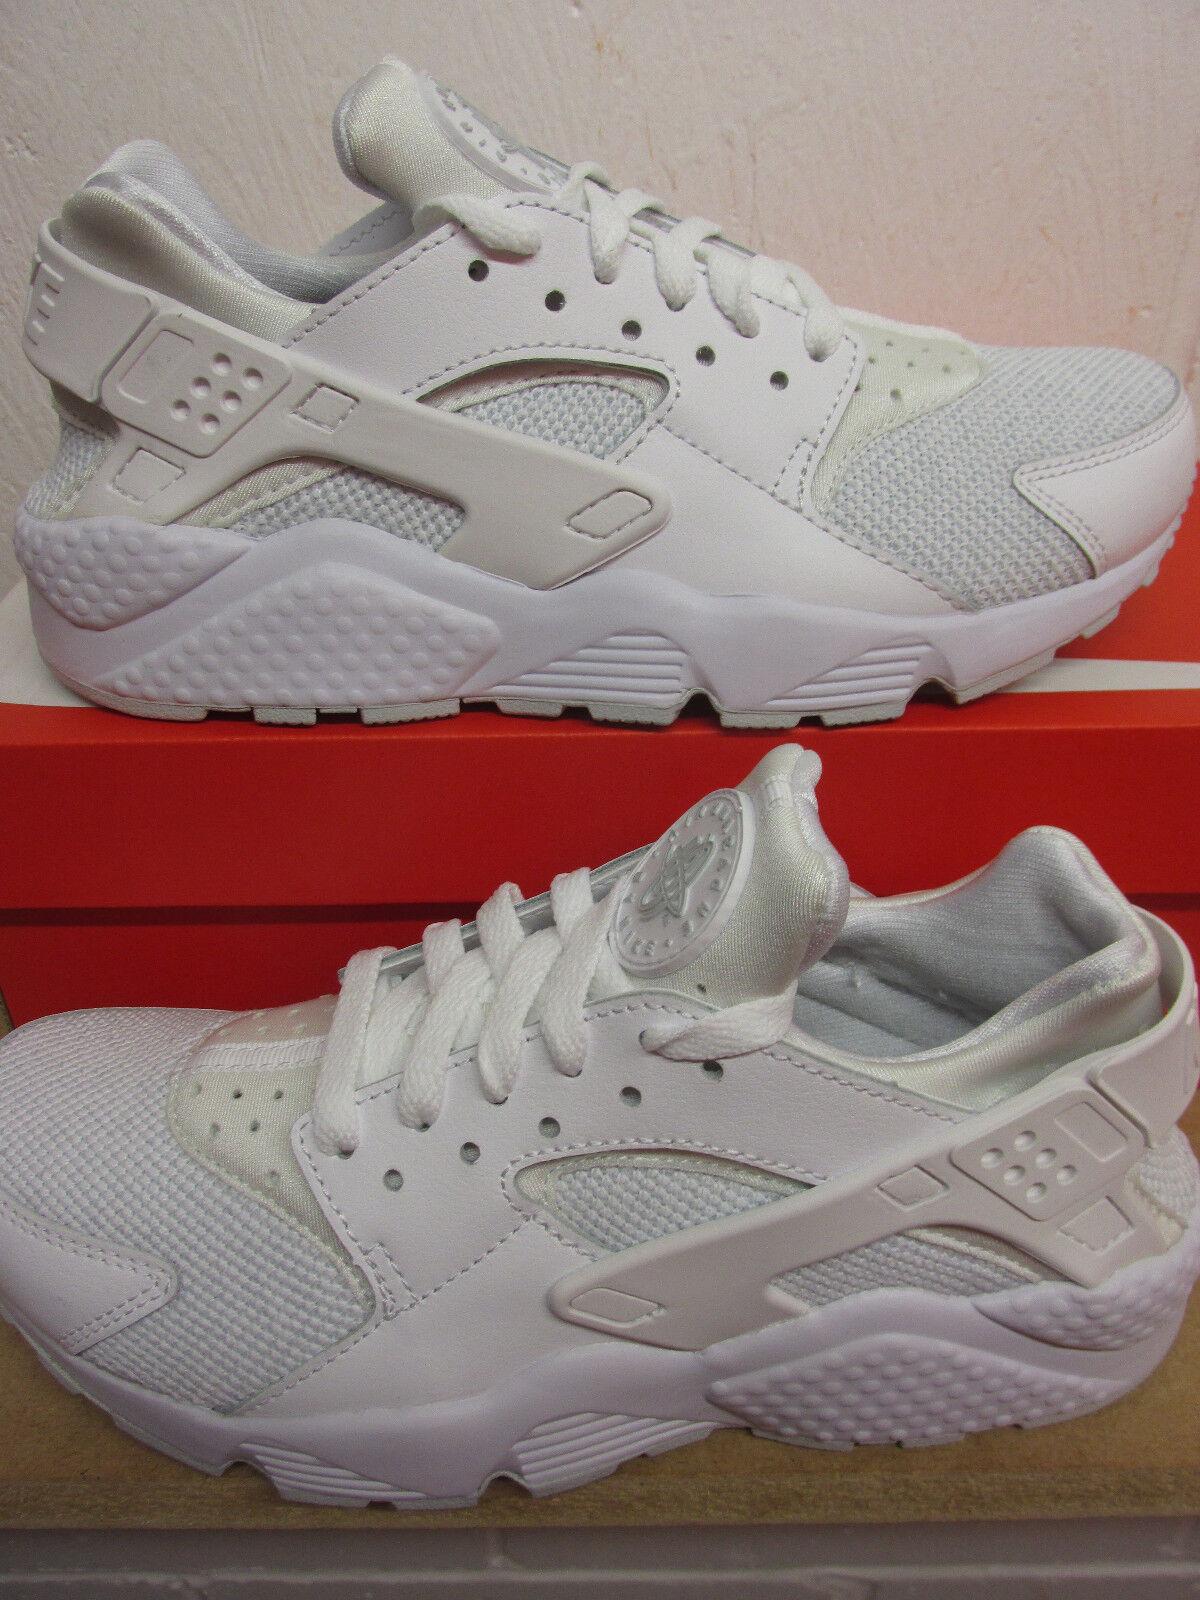 sale retailer 6bff4 8ef9b Nike Air Huarache Homme Running Baskets 318429 109 109 109 Baskets  Chaussures 1647a2